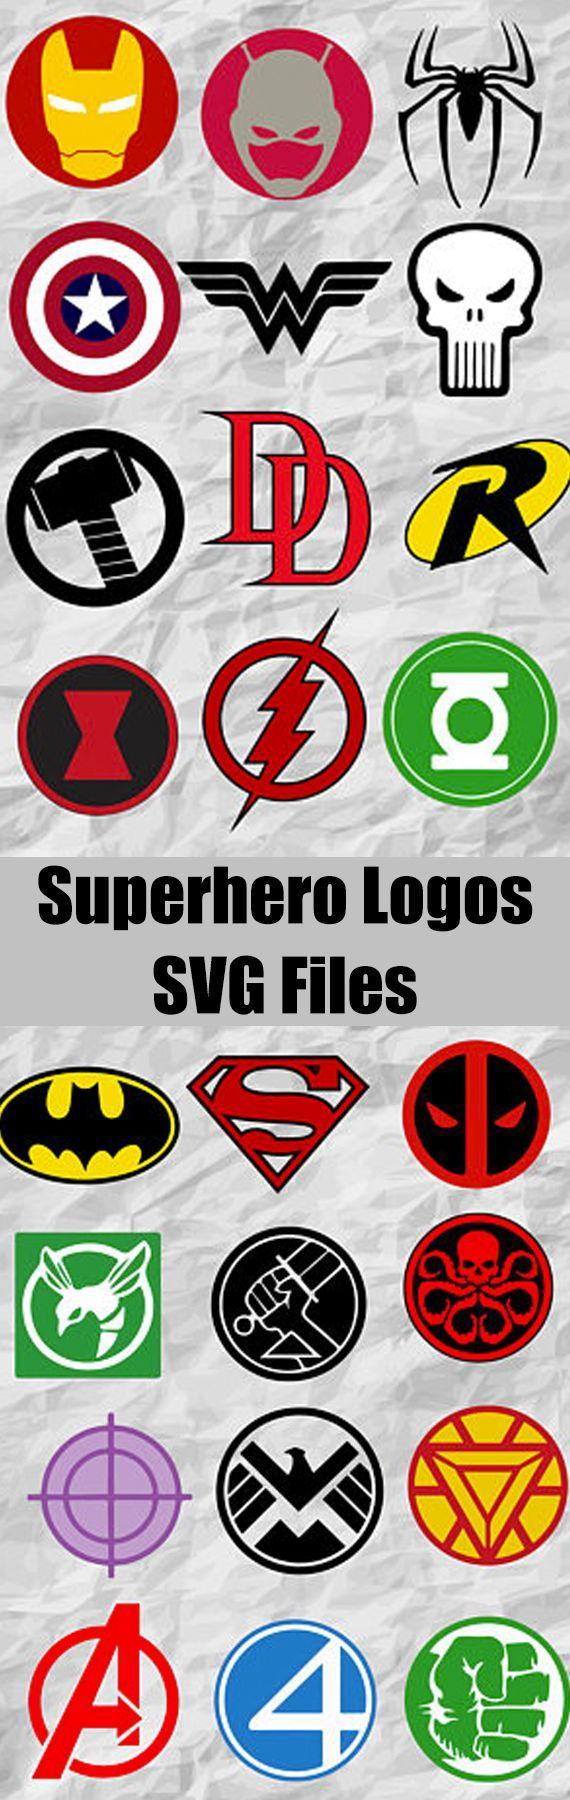 24 Superheroes Logo ClipArts Superheroes SVG cut files Superheroes Bundle digital file vectors instant download printable #logo #superhero #svg #ad #silhouette #cutfile #superman #shield #hulk #hawkeye #avengers #fanstastic4 #ironman #deadpool